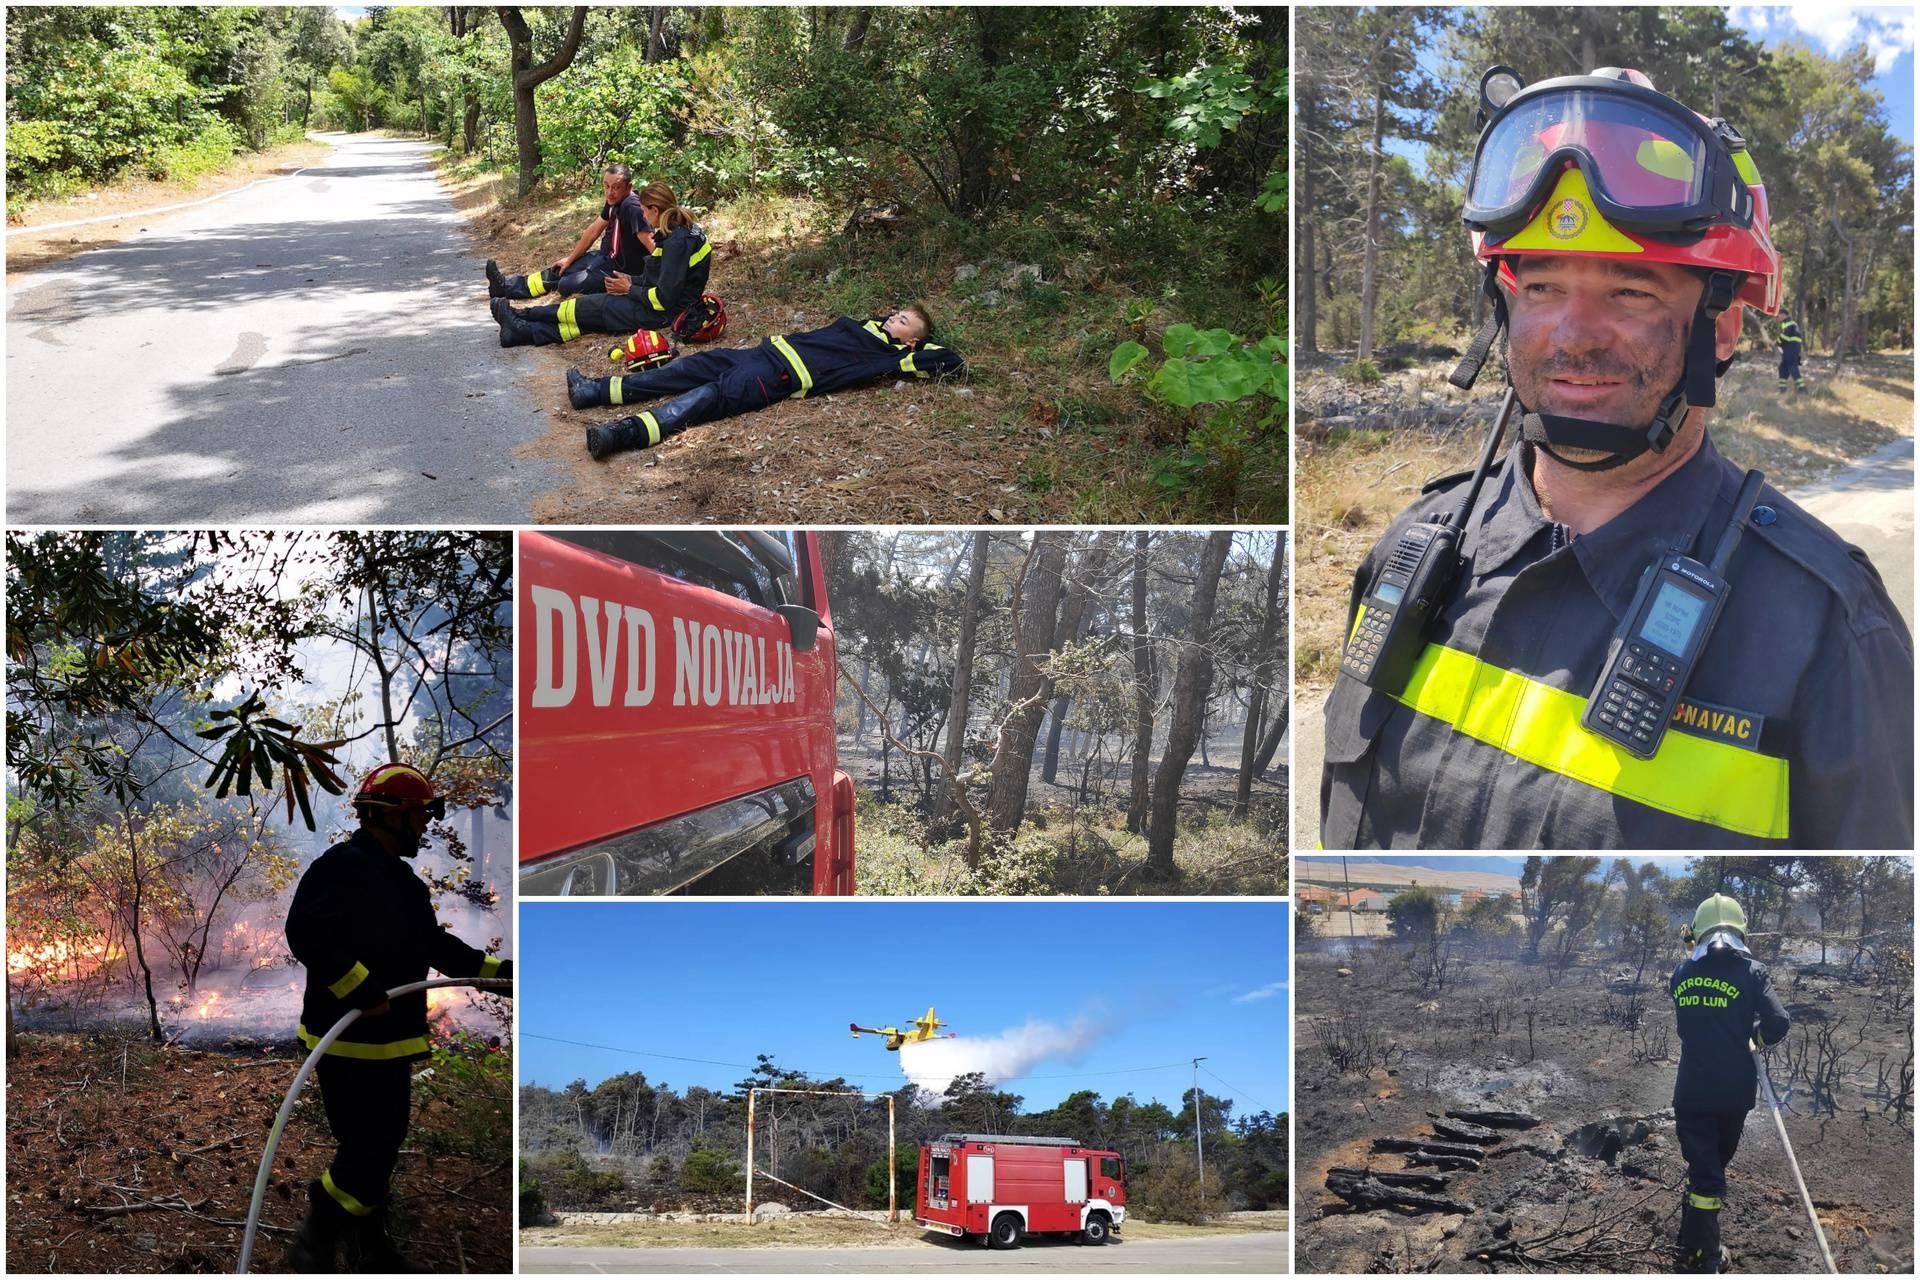 Lokalizirali požar na Zrću, ostaju na terenu da se ne rasplamsa